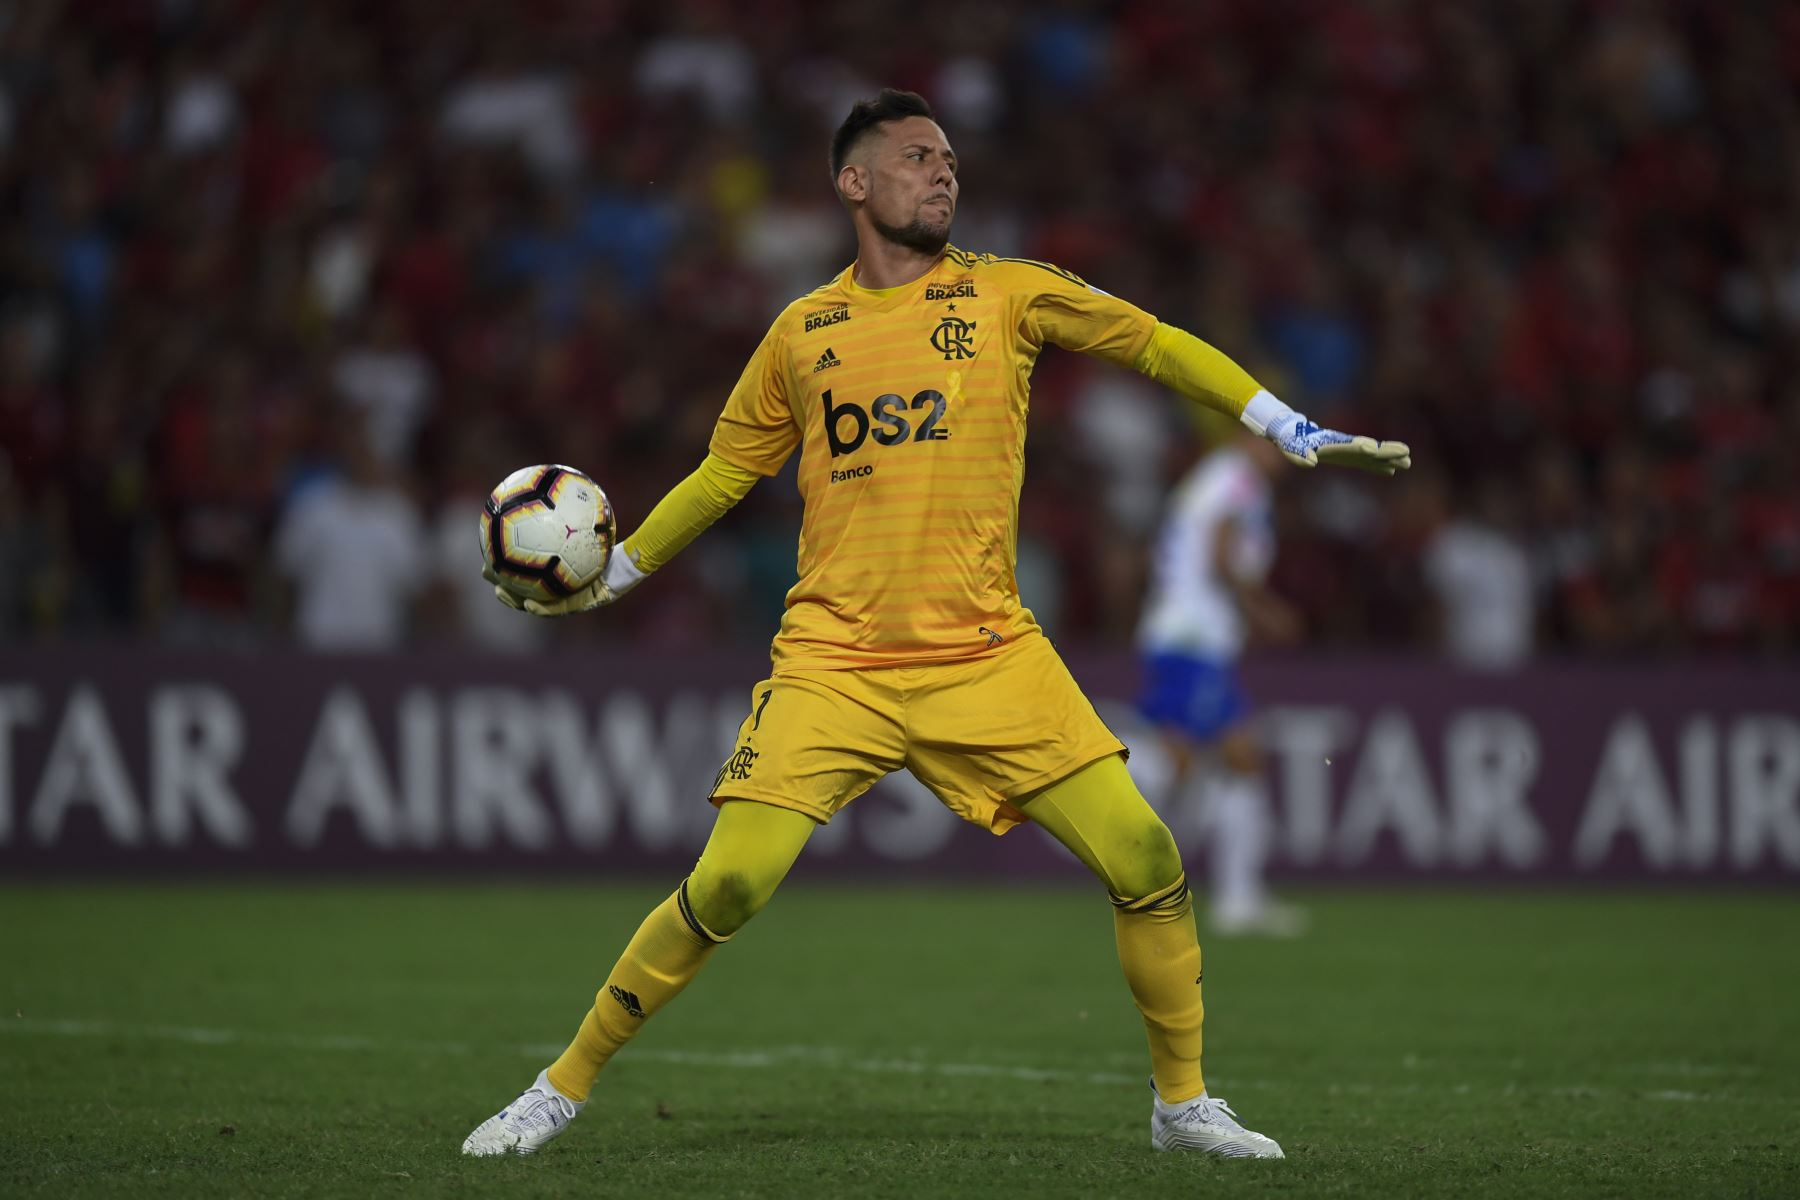 Diego Alves Fecha de nacimiento: 24/06/1985 (34) Valor de mercado: € 4